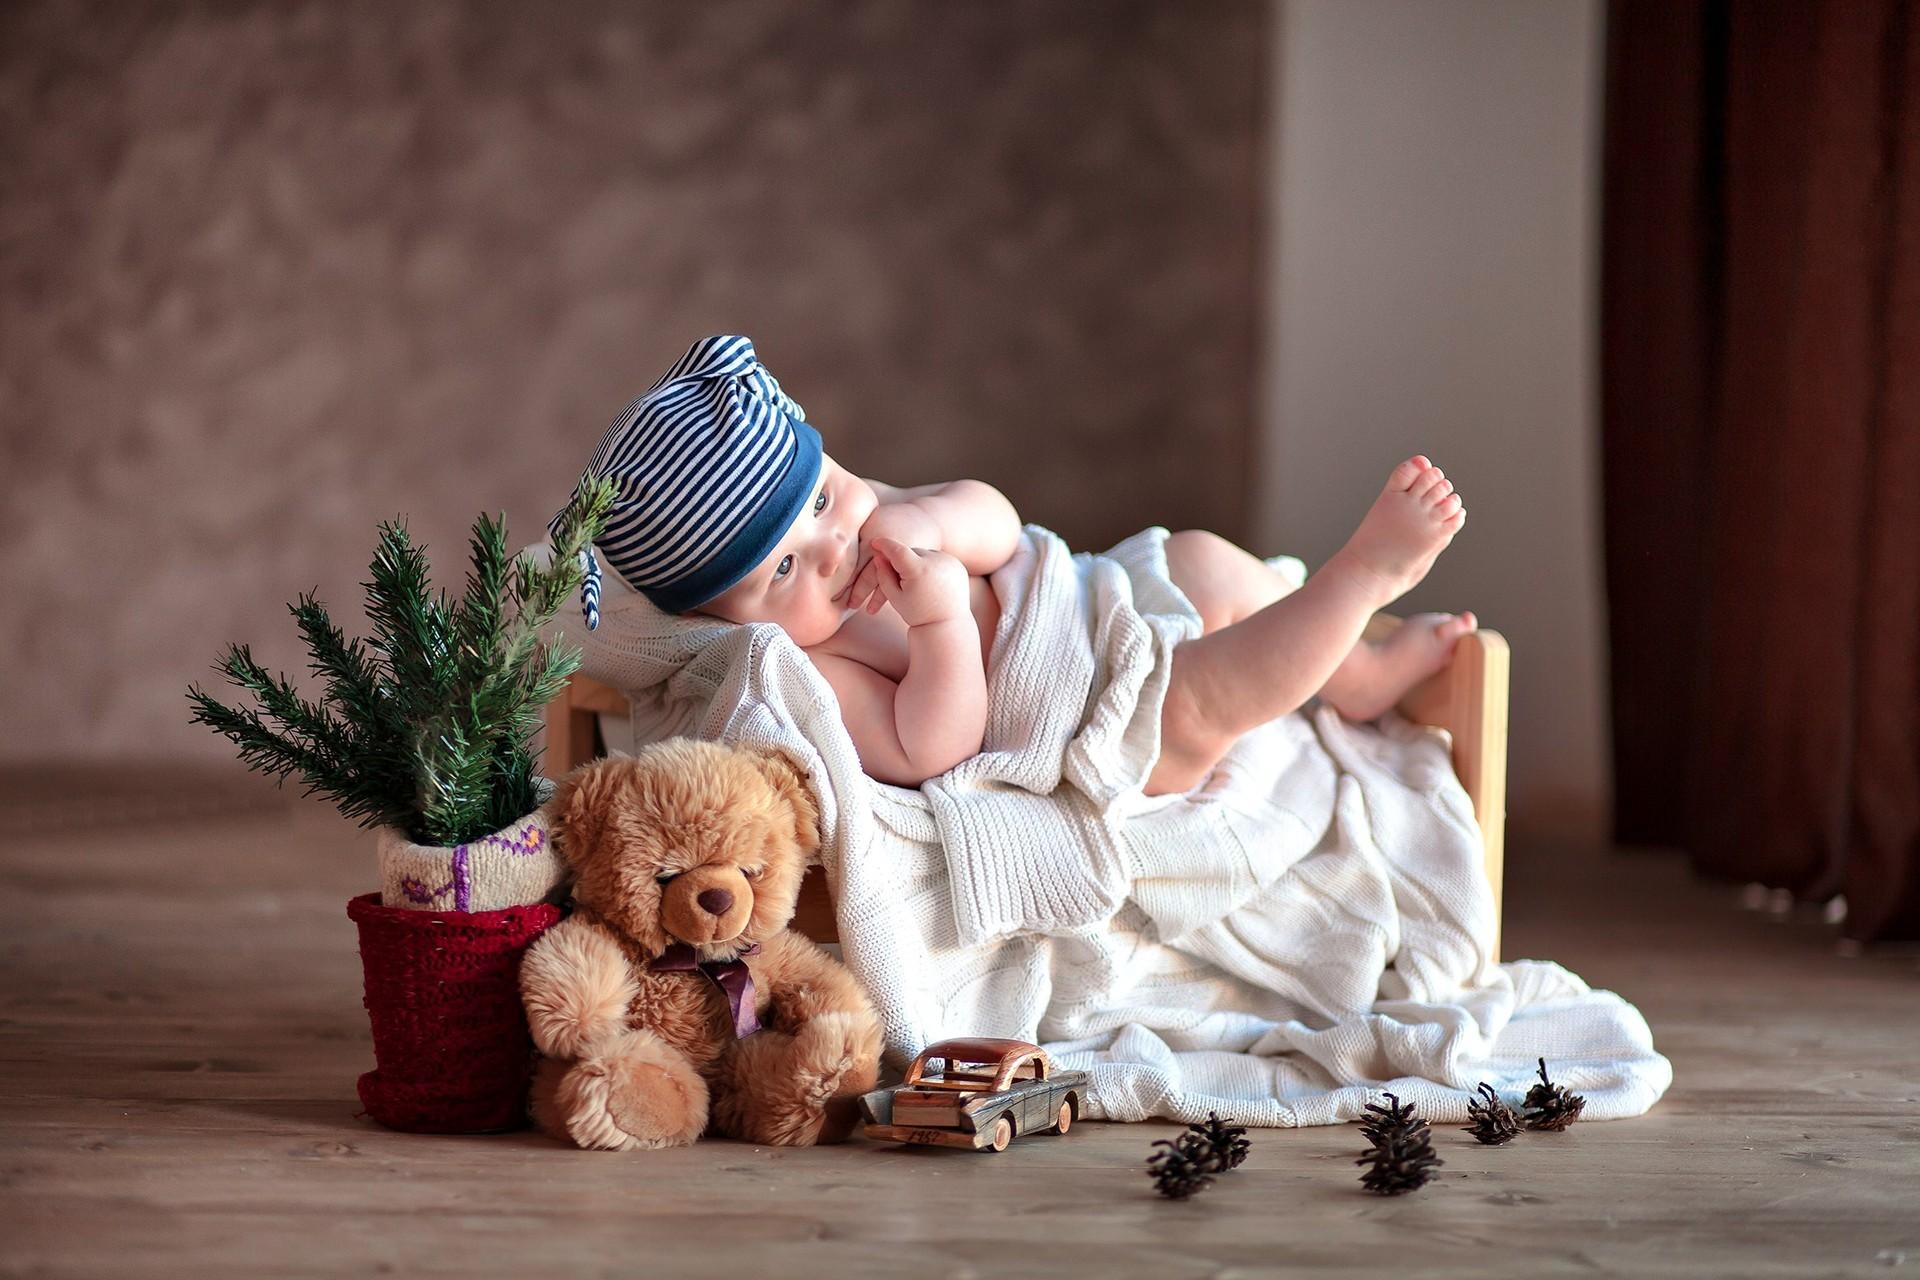 Картинка: Малыш, ребёнок, игрушки, плюшевый мишка, машинка, шишки